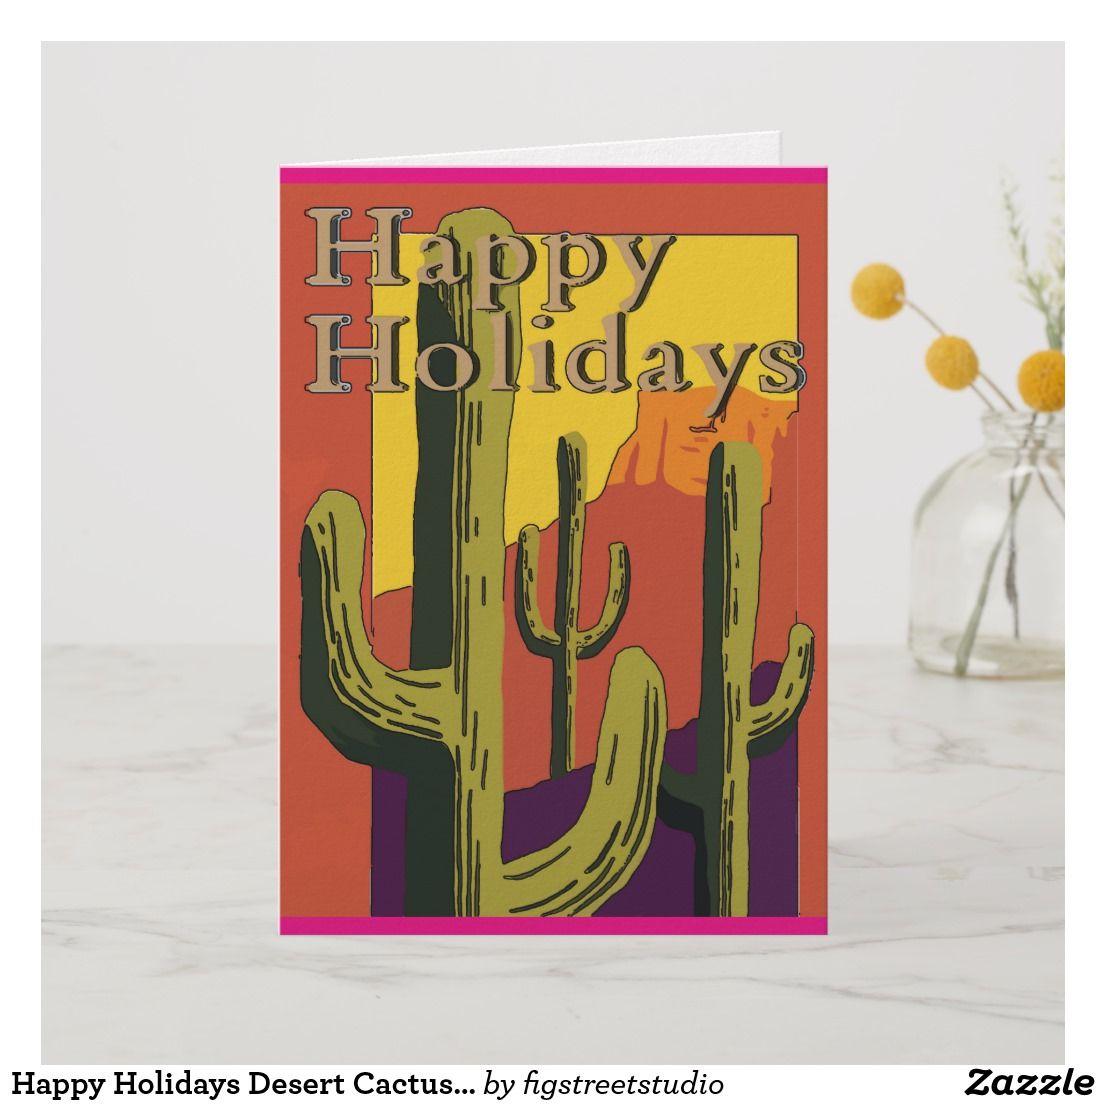 Happy Holidays Desert Cactus Christmas Holiday Card Zazzle Com Christmas Holiday Cards Holiday Design Card Holiday Desert